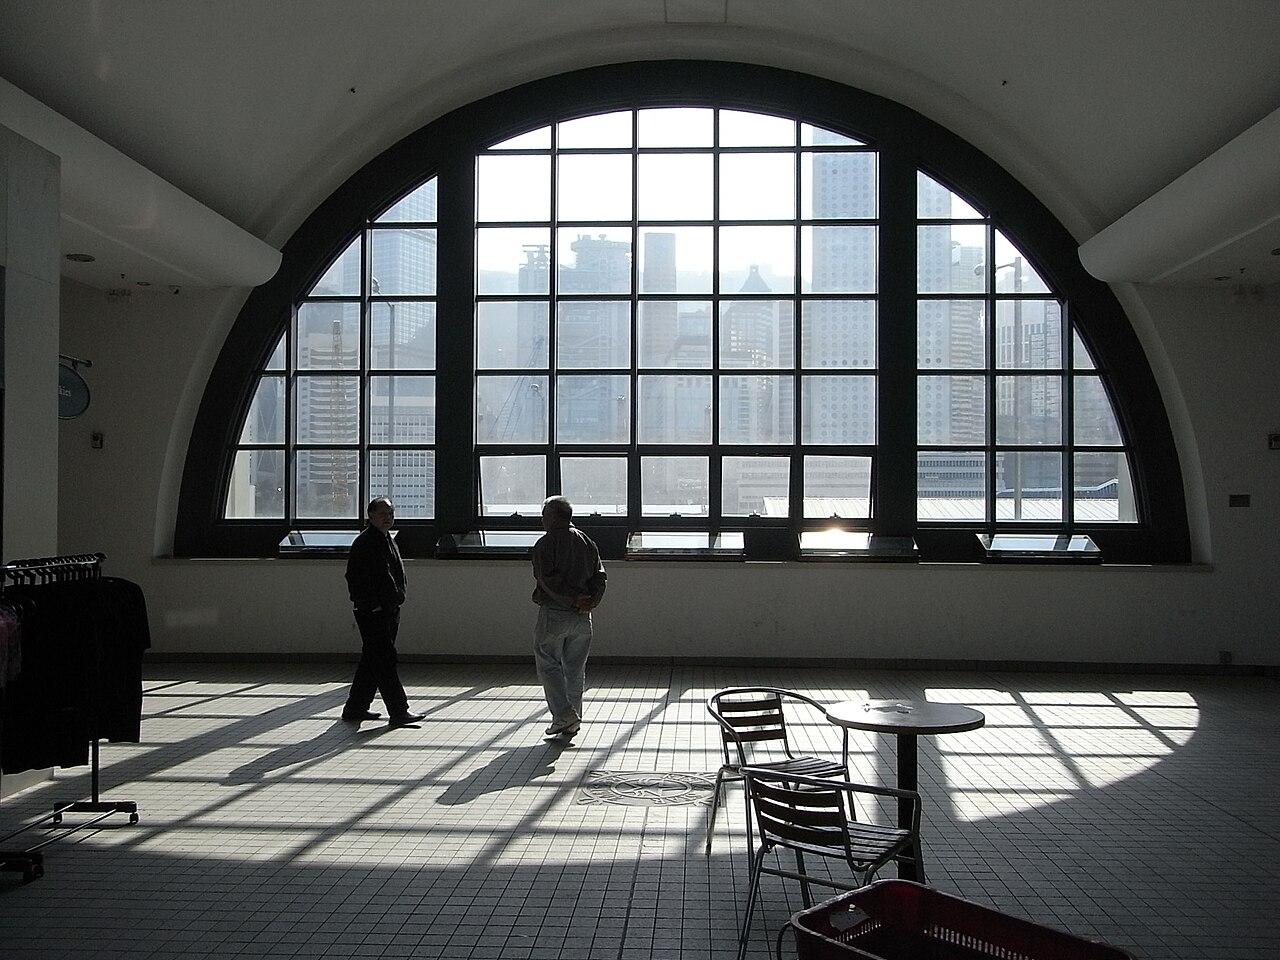 Interior windows - File Hk Central Piers Interior Window Shadow Jpg